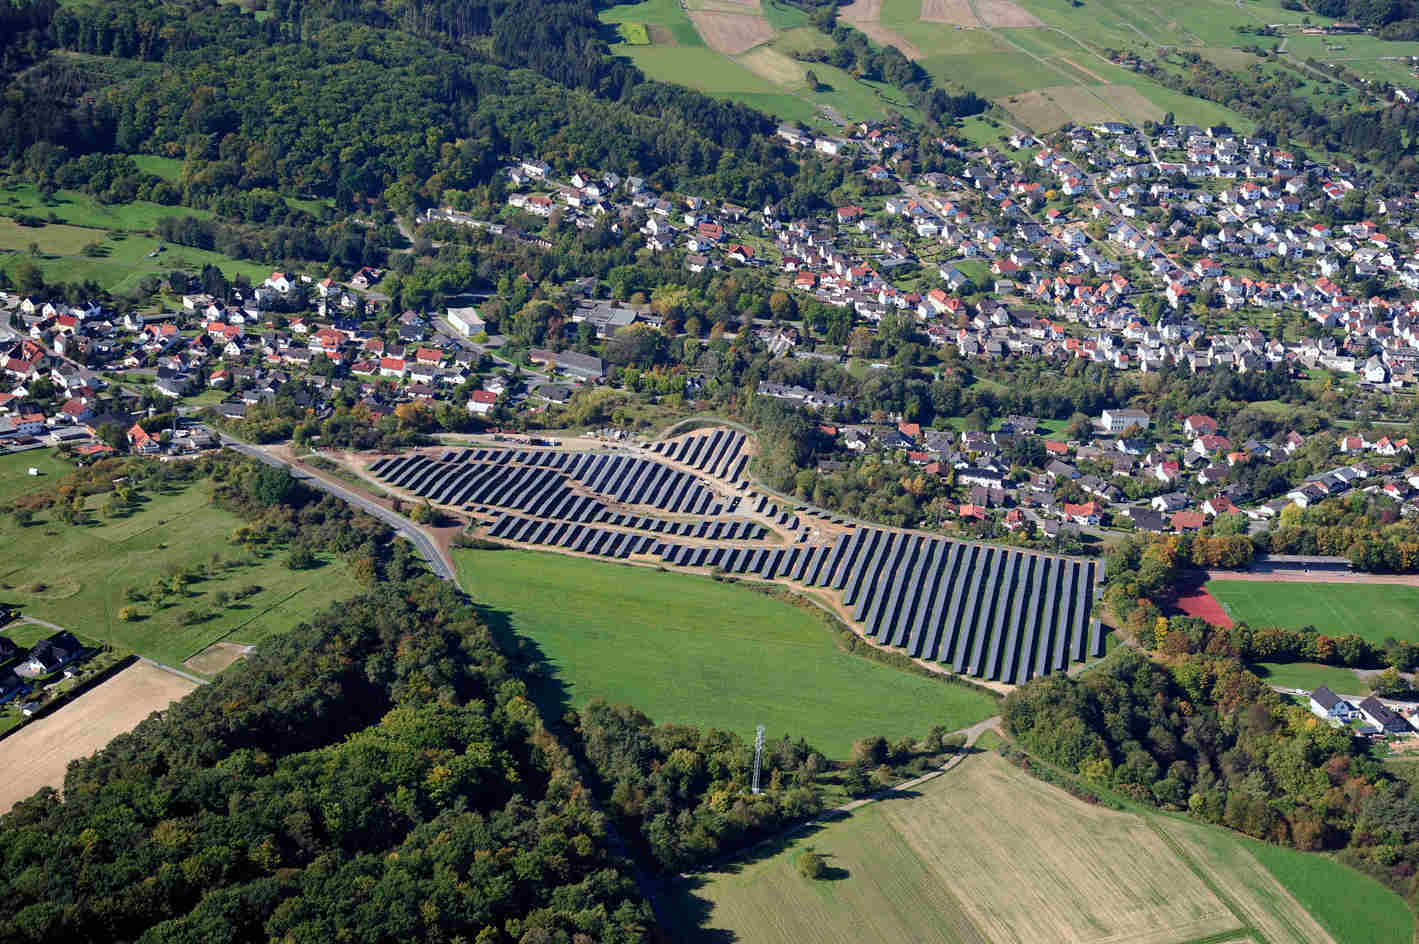 Luftbild 1 der Sybac Solar